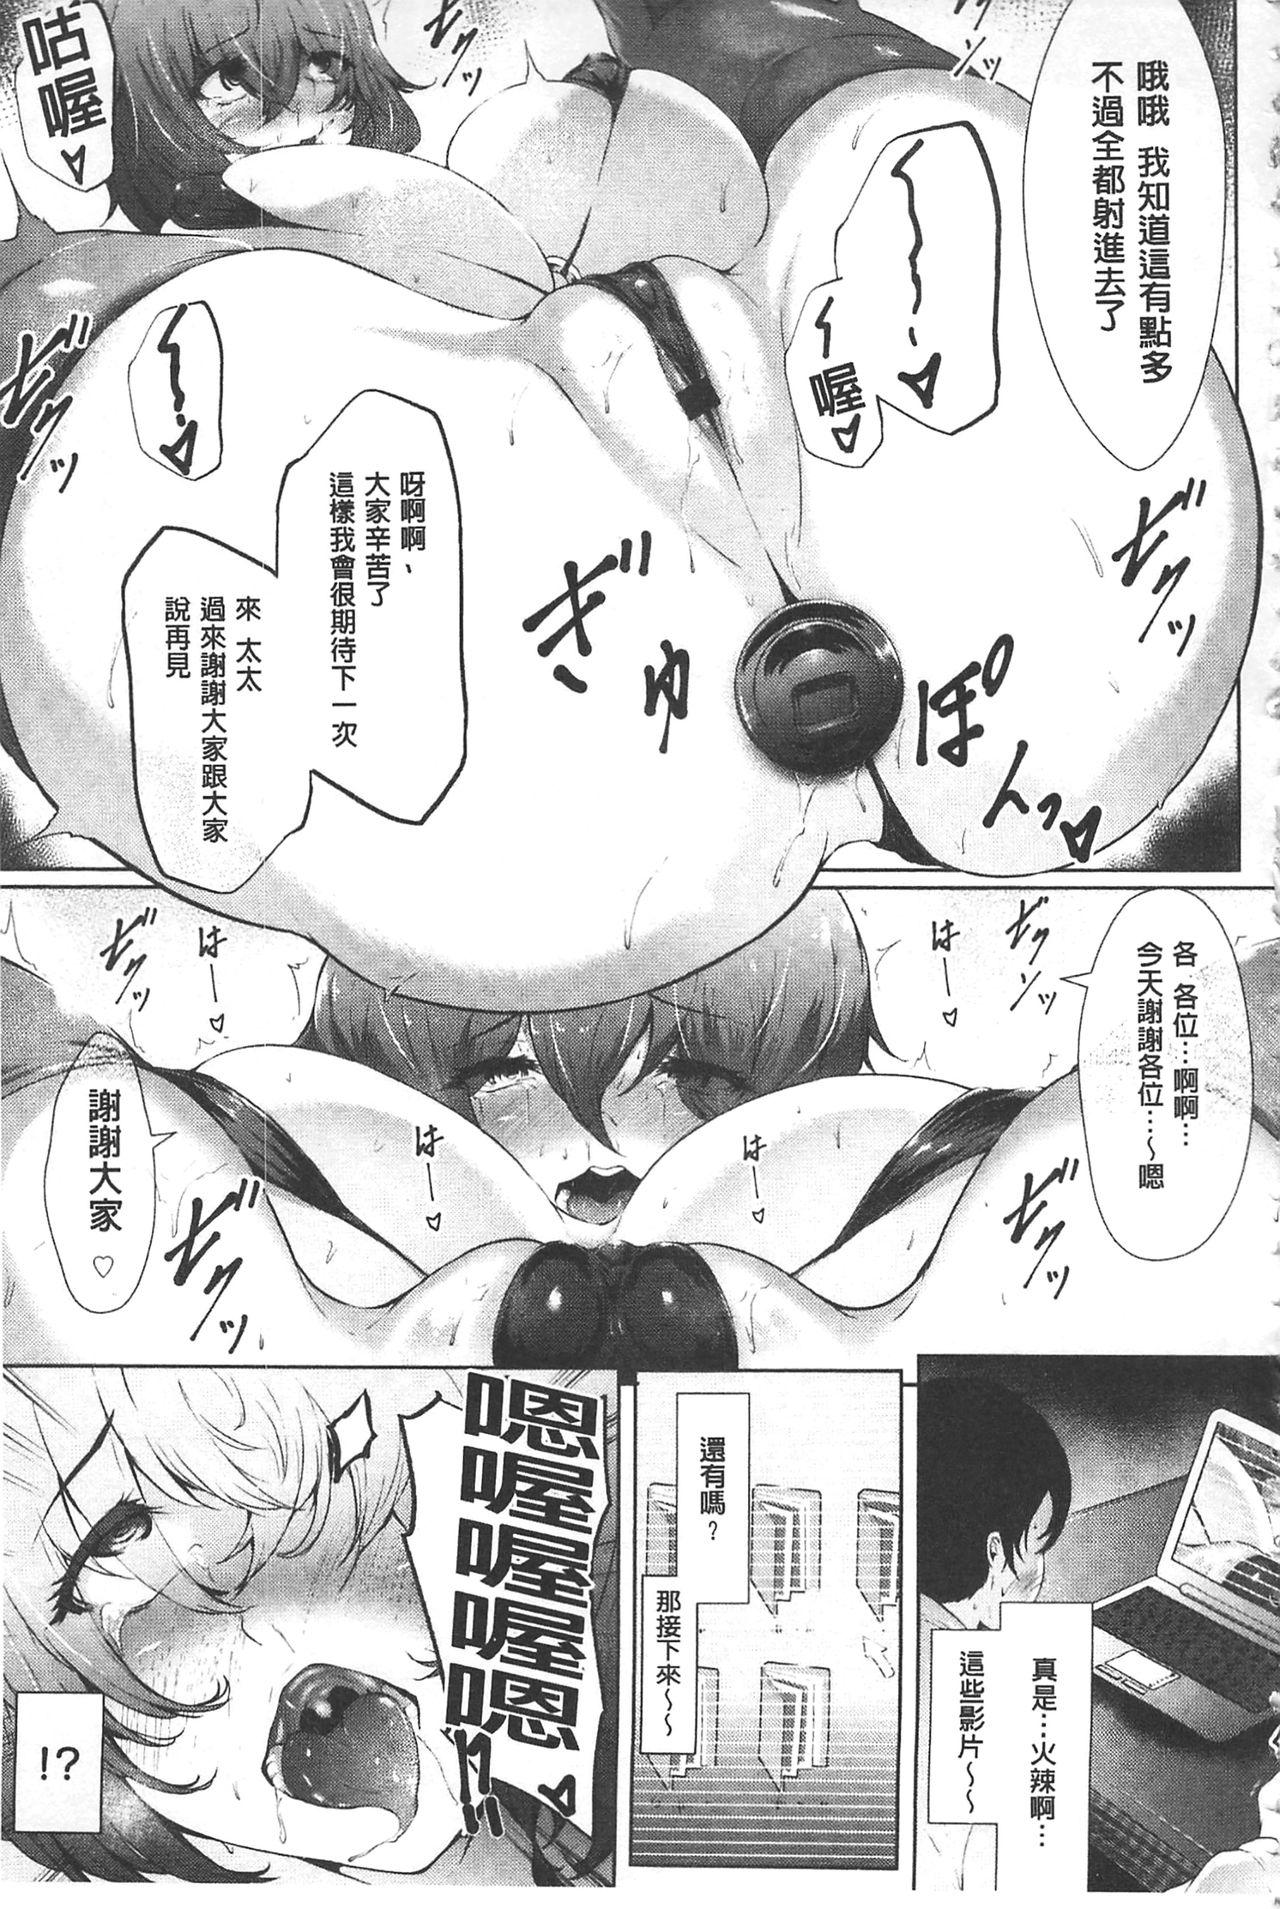 [Lorica] Biinkan Anal ~Kakusei Nejikomi Ana~ | 美淫感猥菊花 塞入擴張覺醒穴 [Chinese] 157